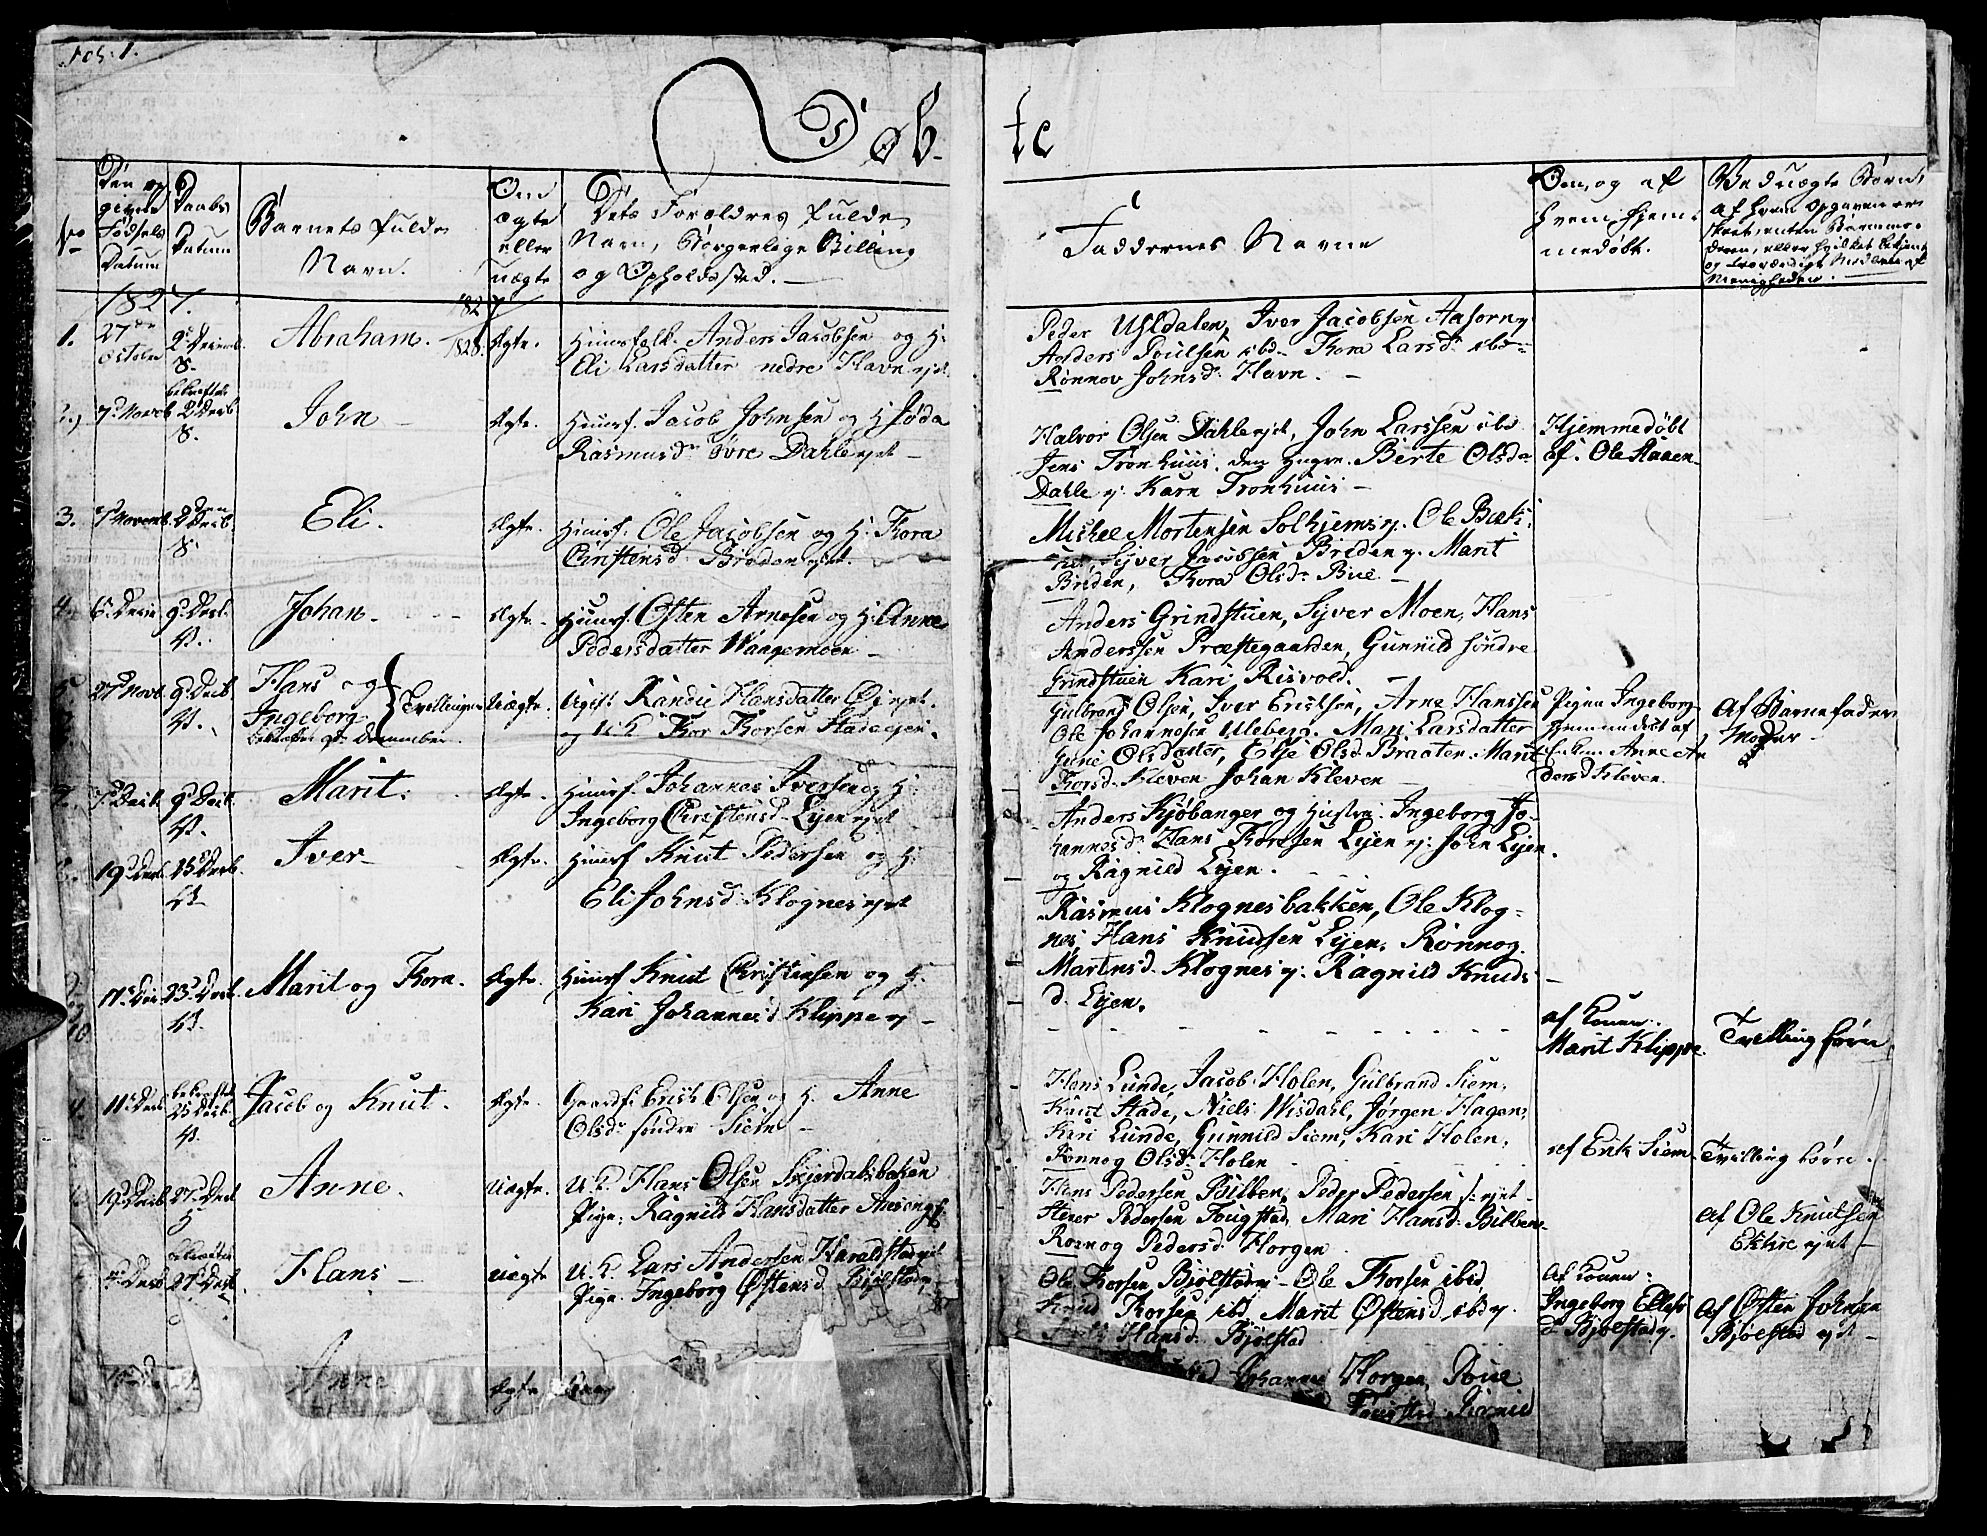 SAH, Vågå prestekontor, Ministerialbok nr. 4 /1, 1827-1842, s. 1